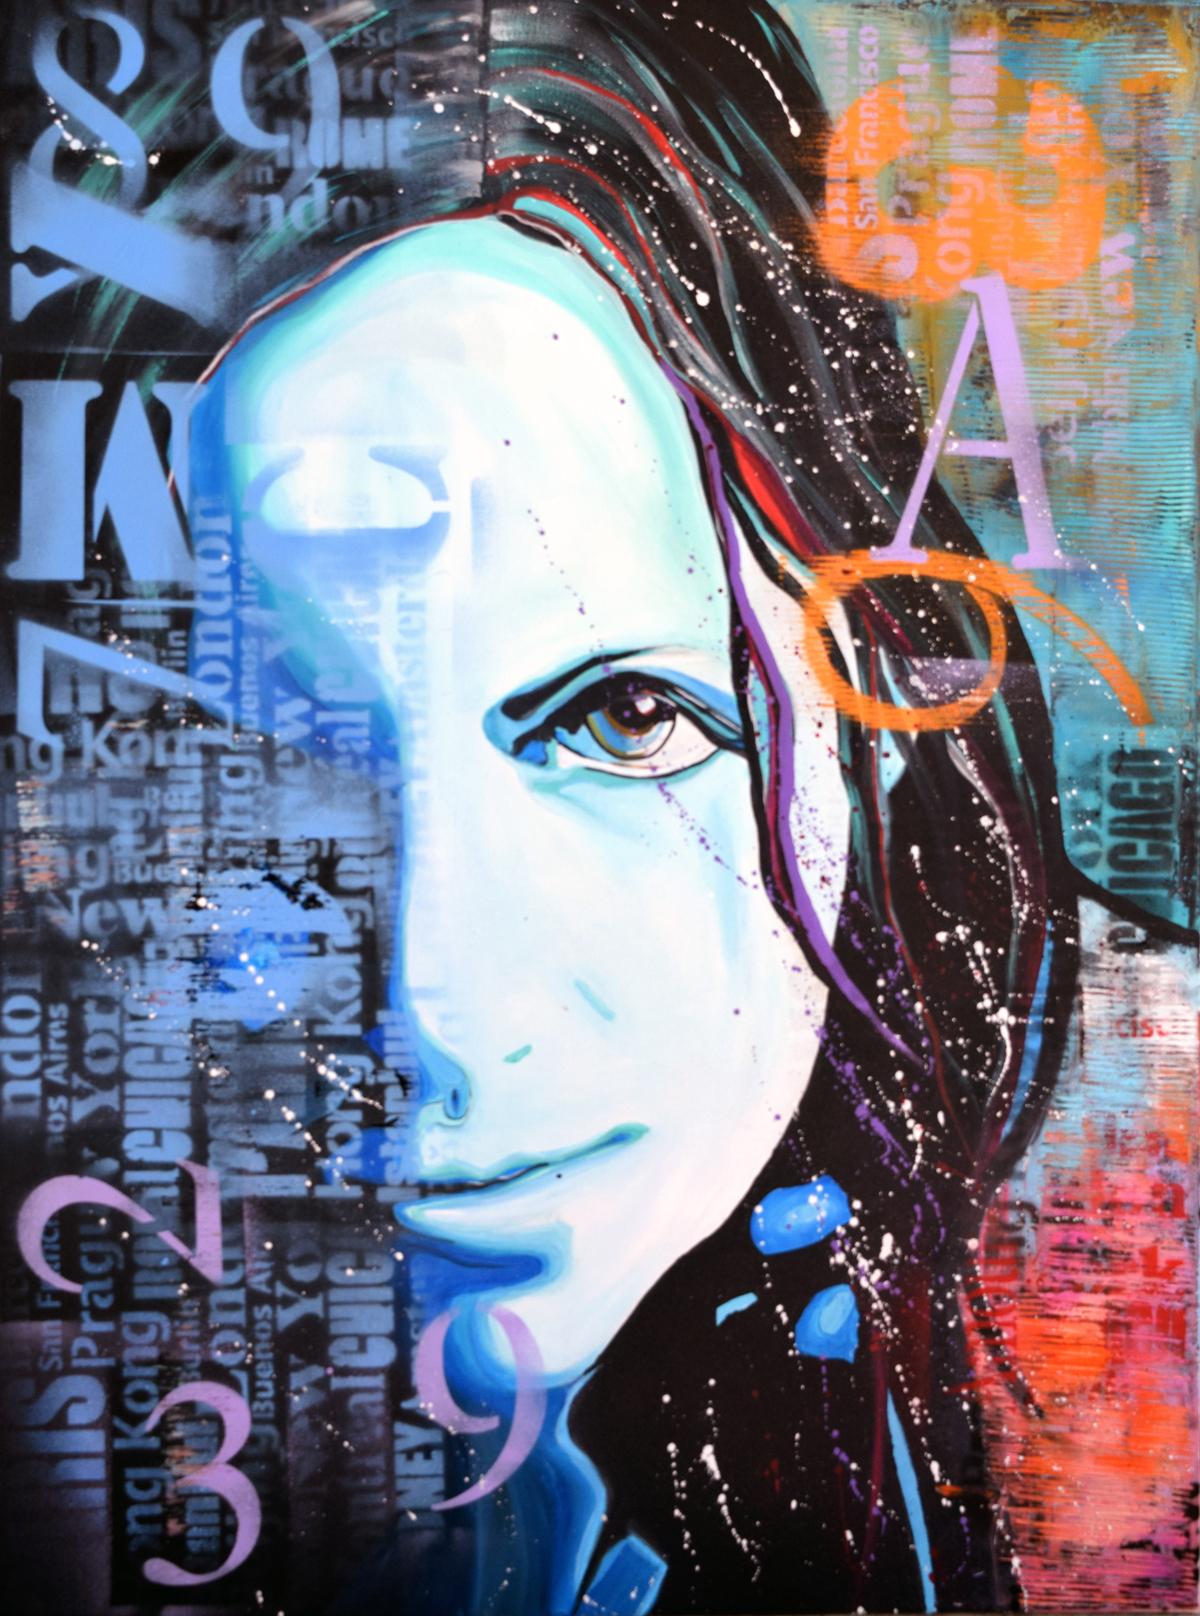 Art by Ada - Buy Original Art Online | Artfinder